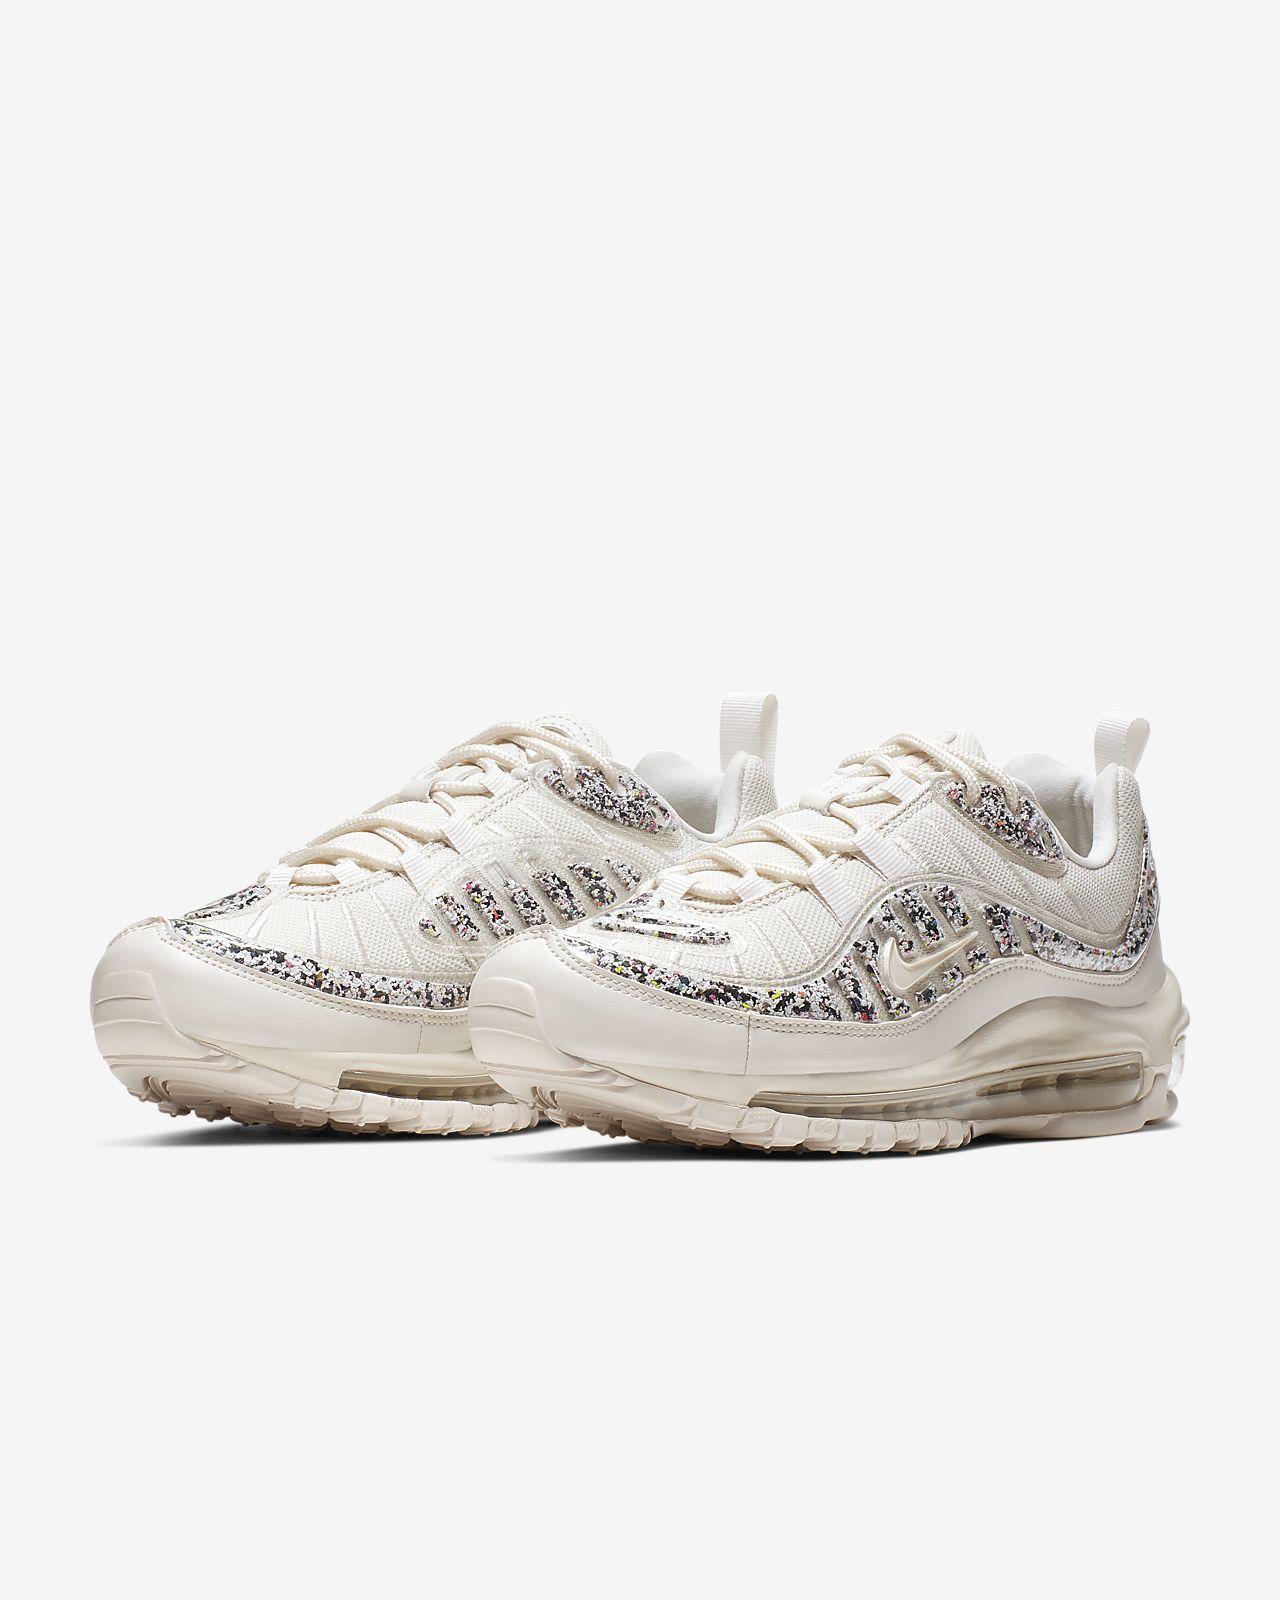 Women's Nike Air Max 98 Casual Shoes